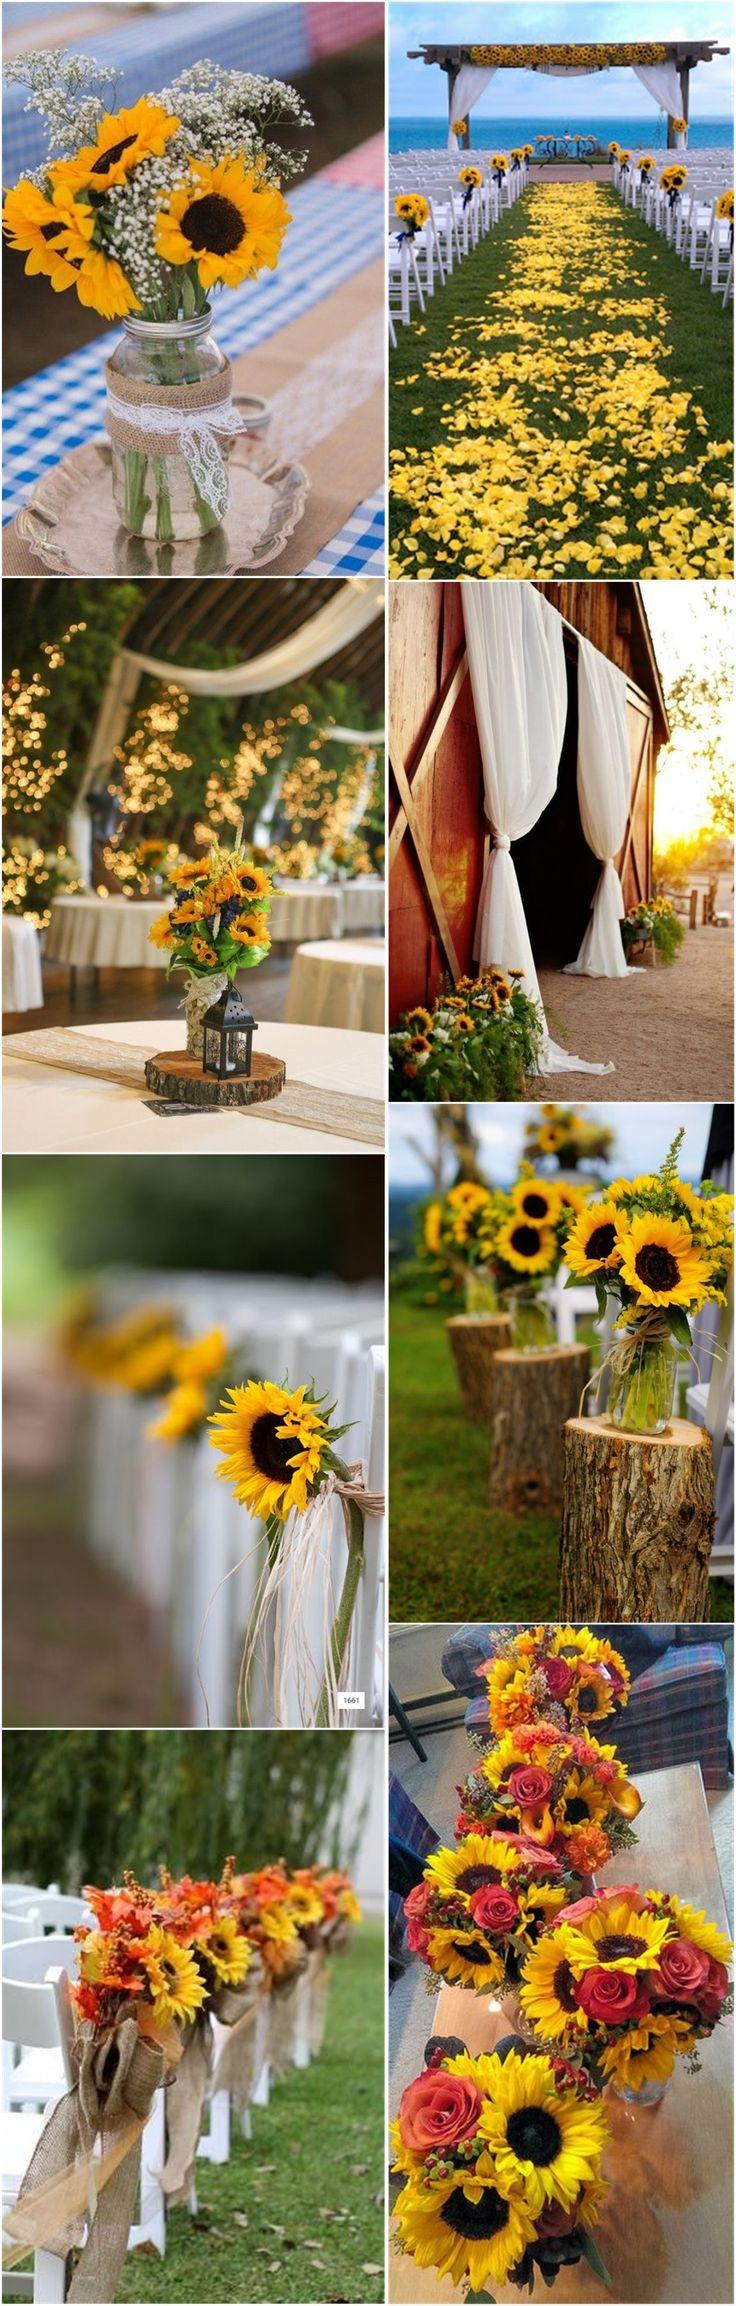 best 25 rustic sunflower centerpieces ideas on pinterest sunflower wedding centerpieces. Black Bedroom Furniture Sets. Home Design Ideas